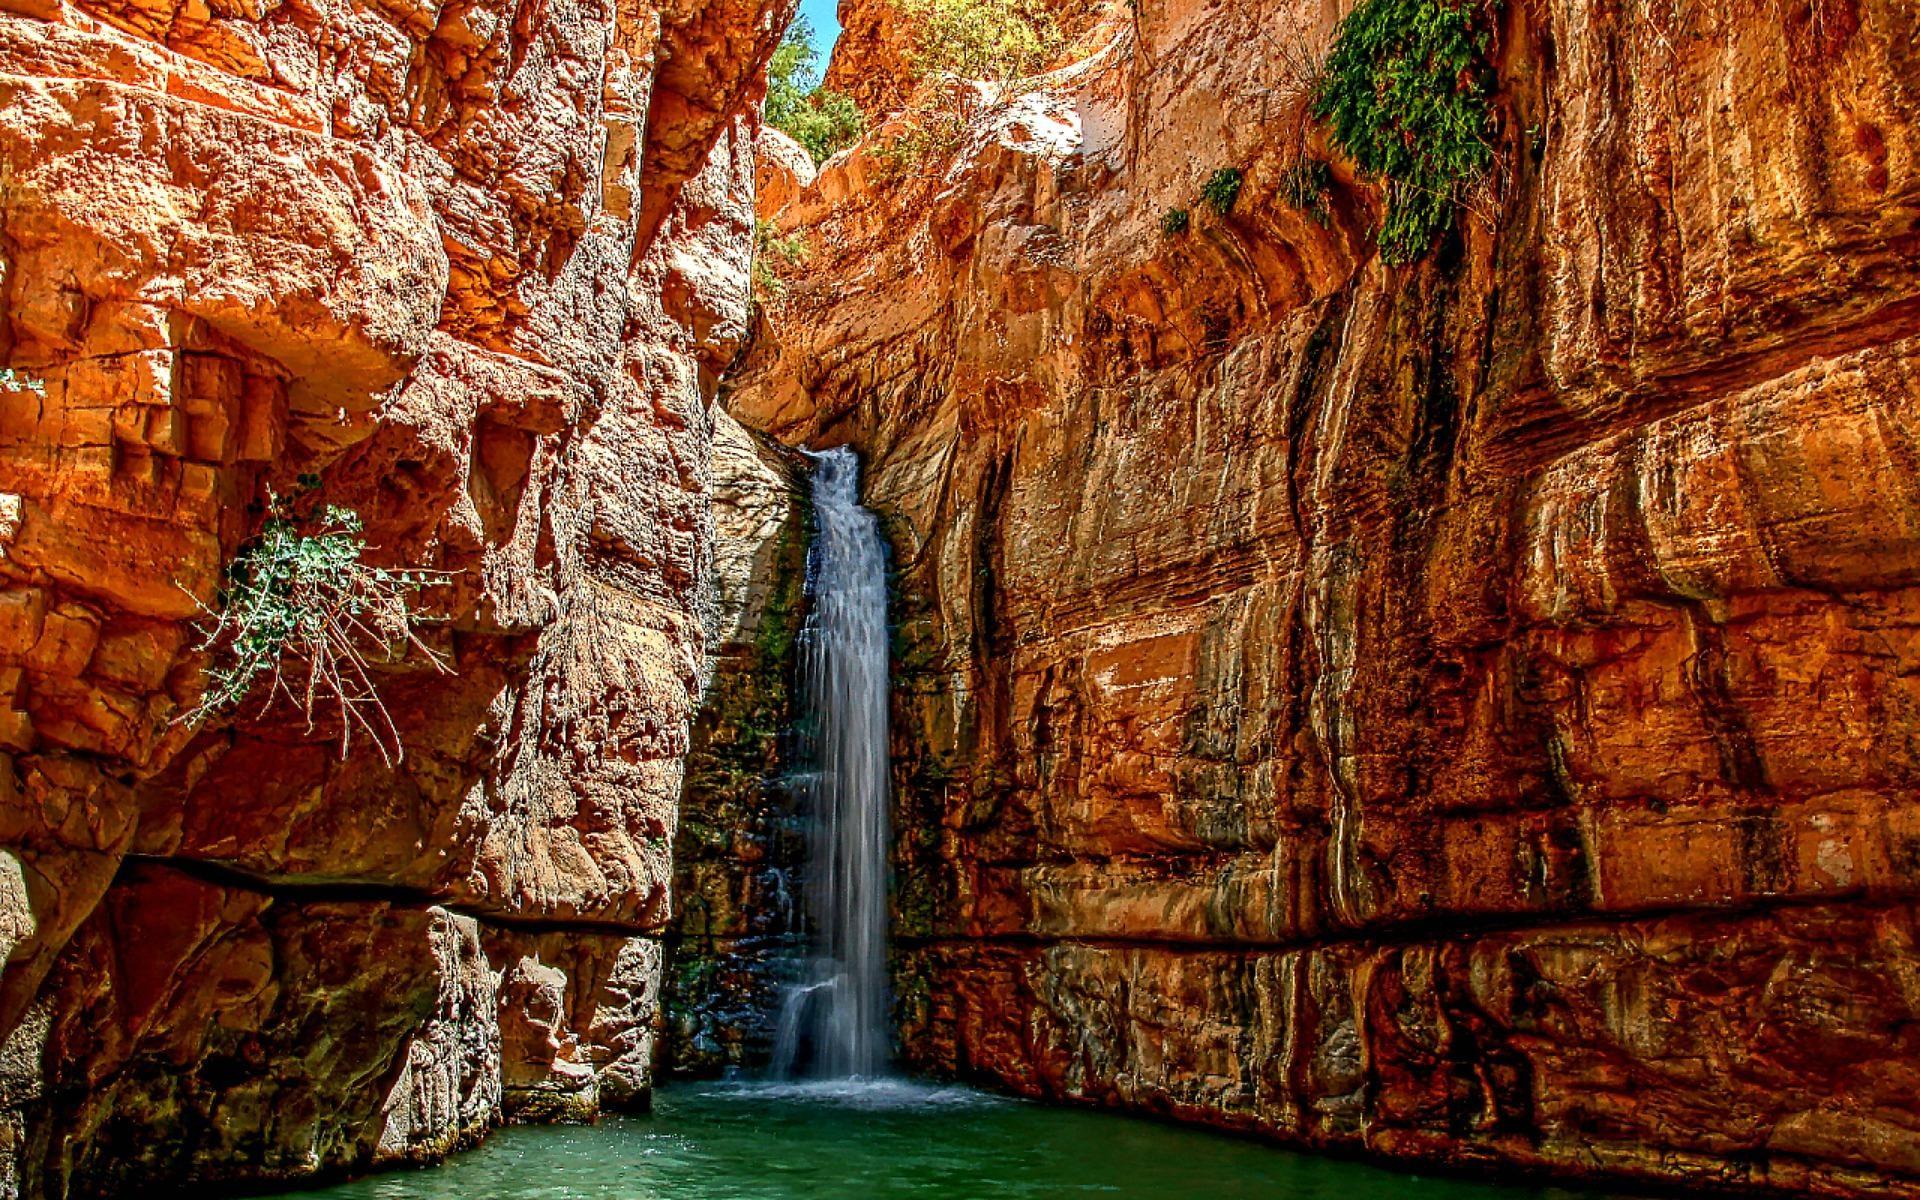 Jerusalem Waterfalls | Arugot River Waterfall Israel Nature hd wallpaper  #1806416